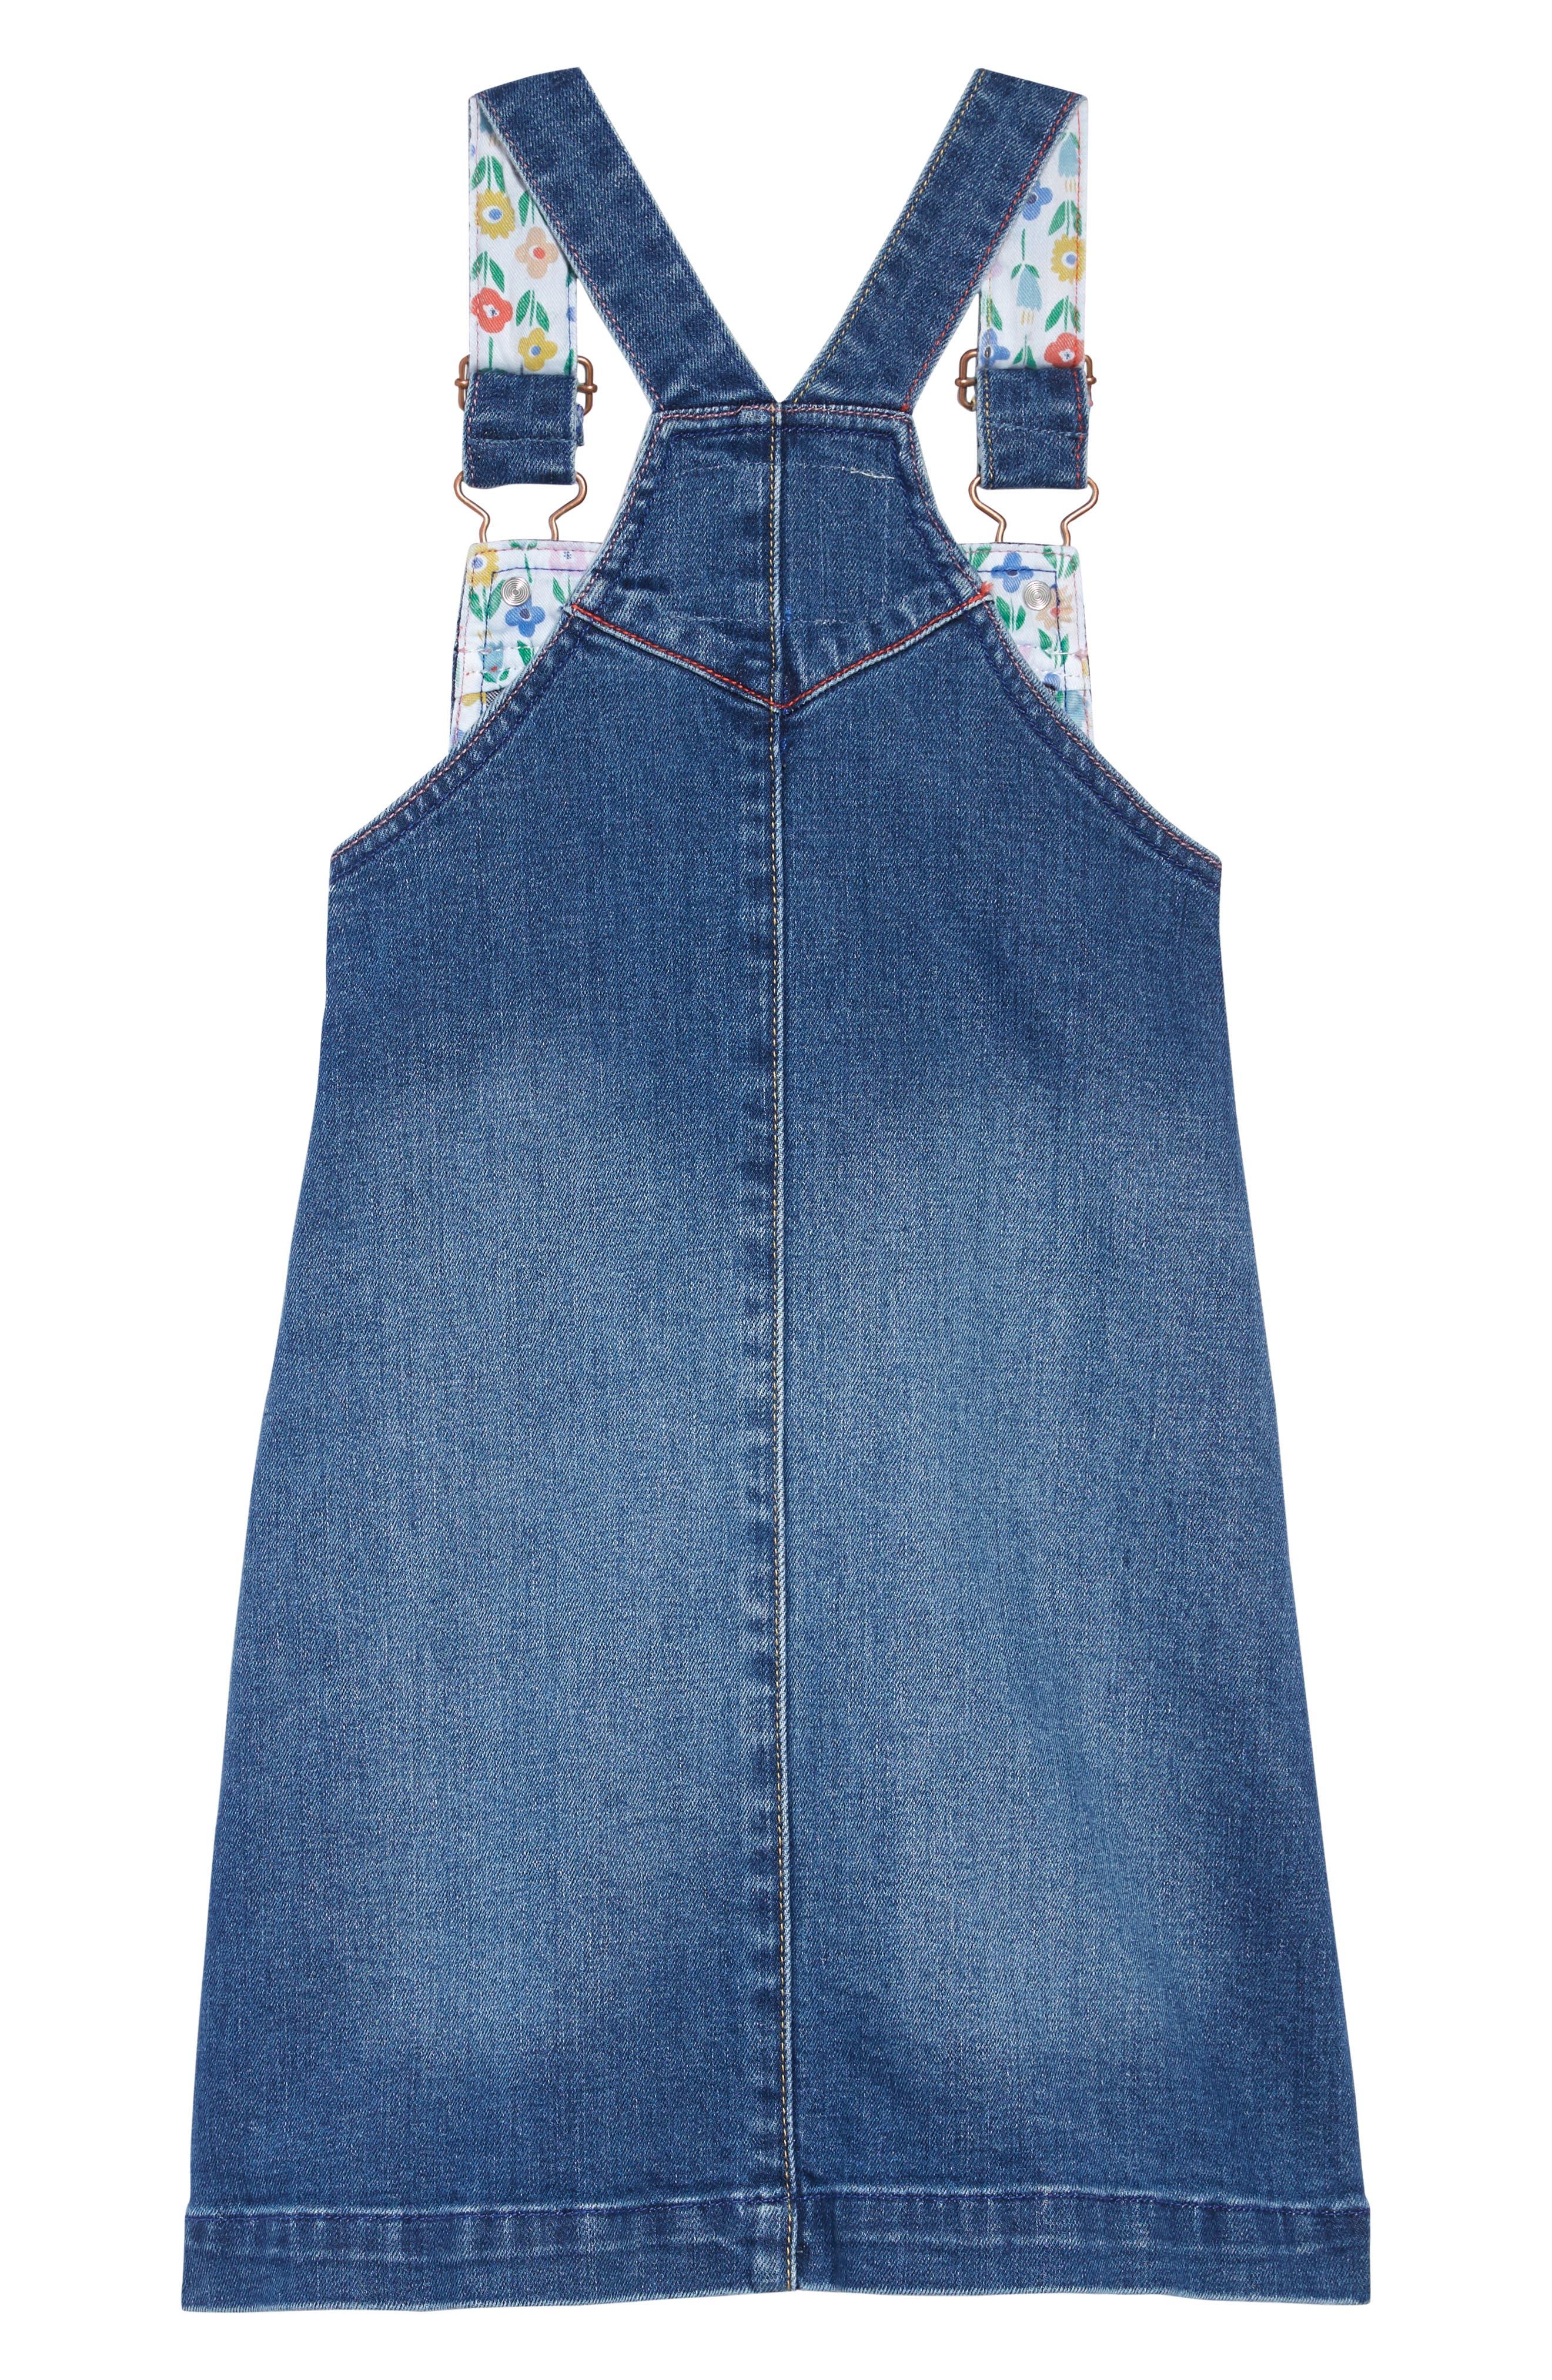 BODEN,                             Mini Boden Denim Dungaree Overall Dress,                             Alternate thumbnail 2, color,                             LIGHT VINTAGE BLUE RAINBOWS